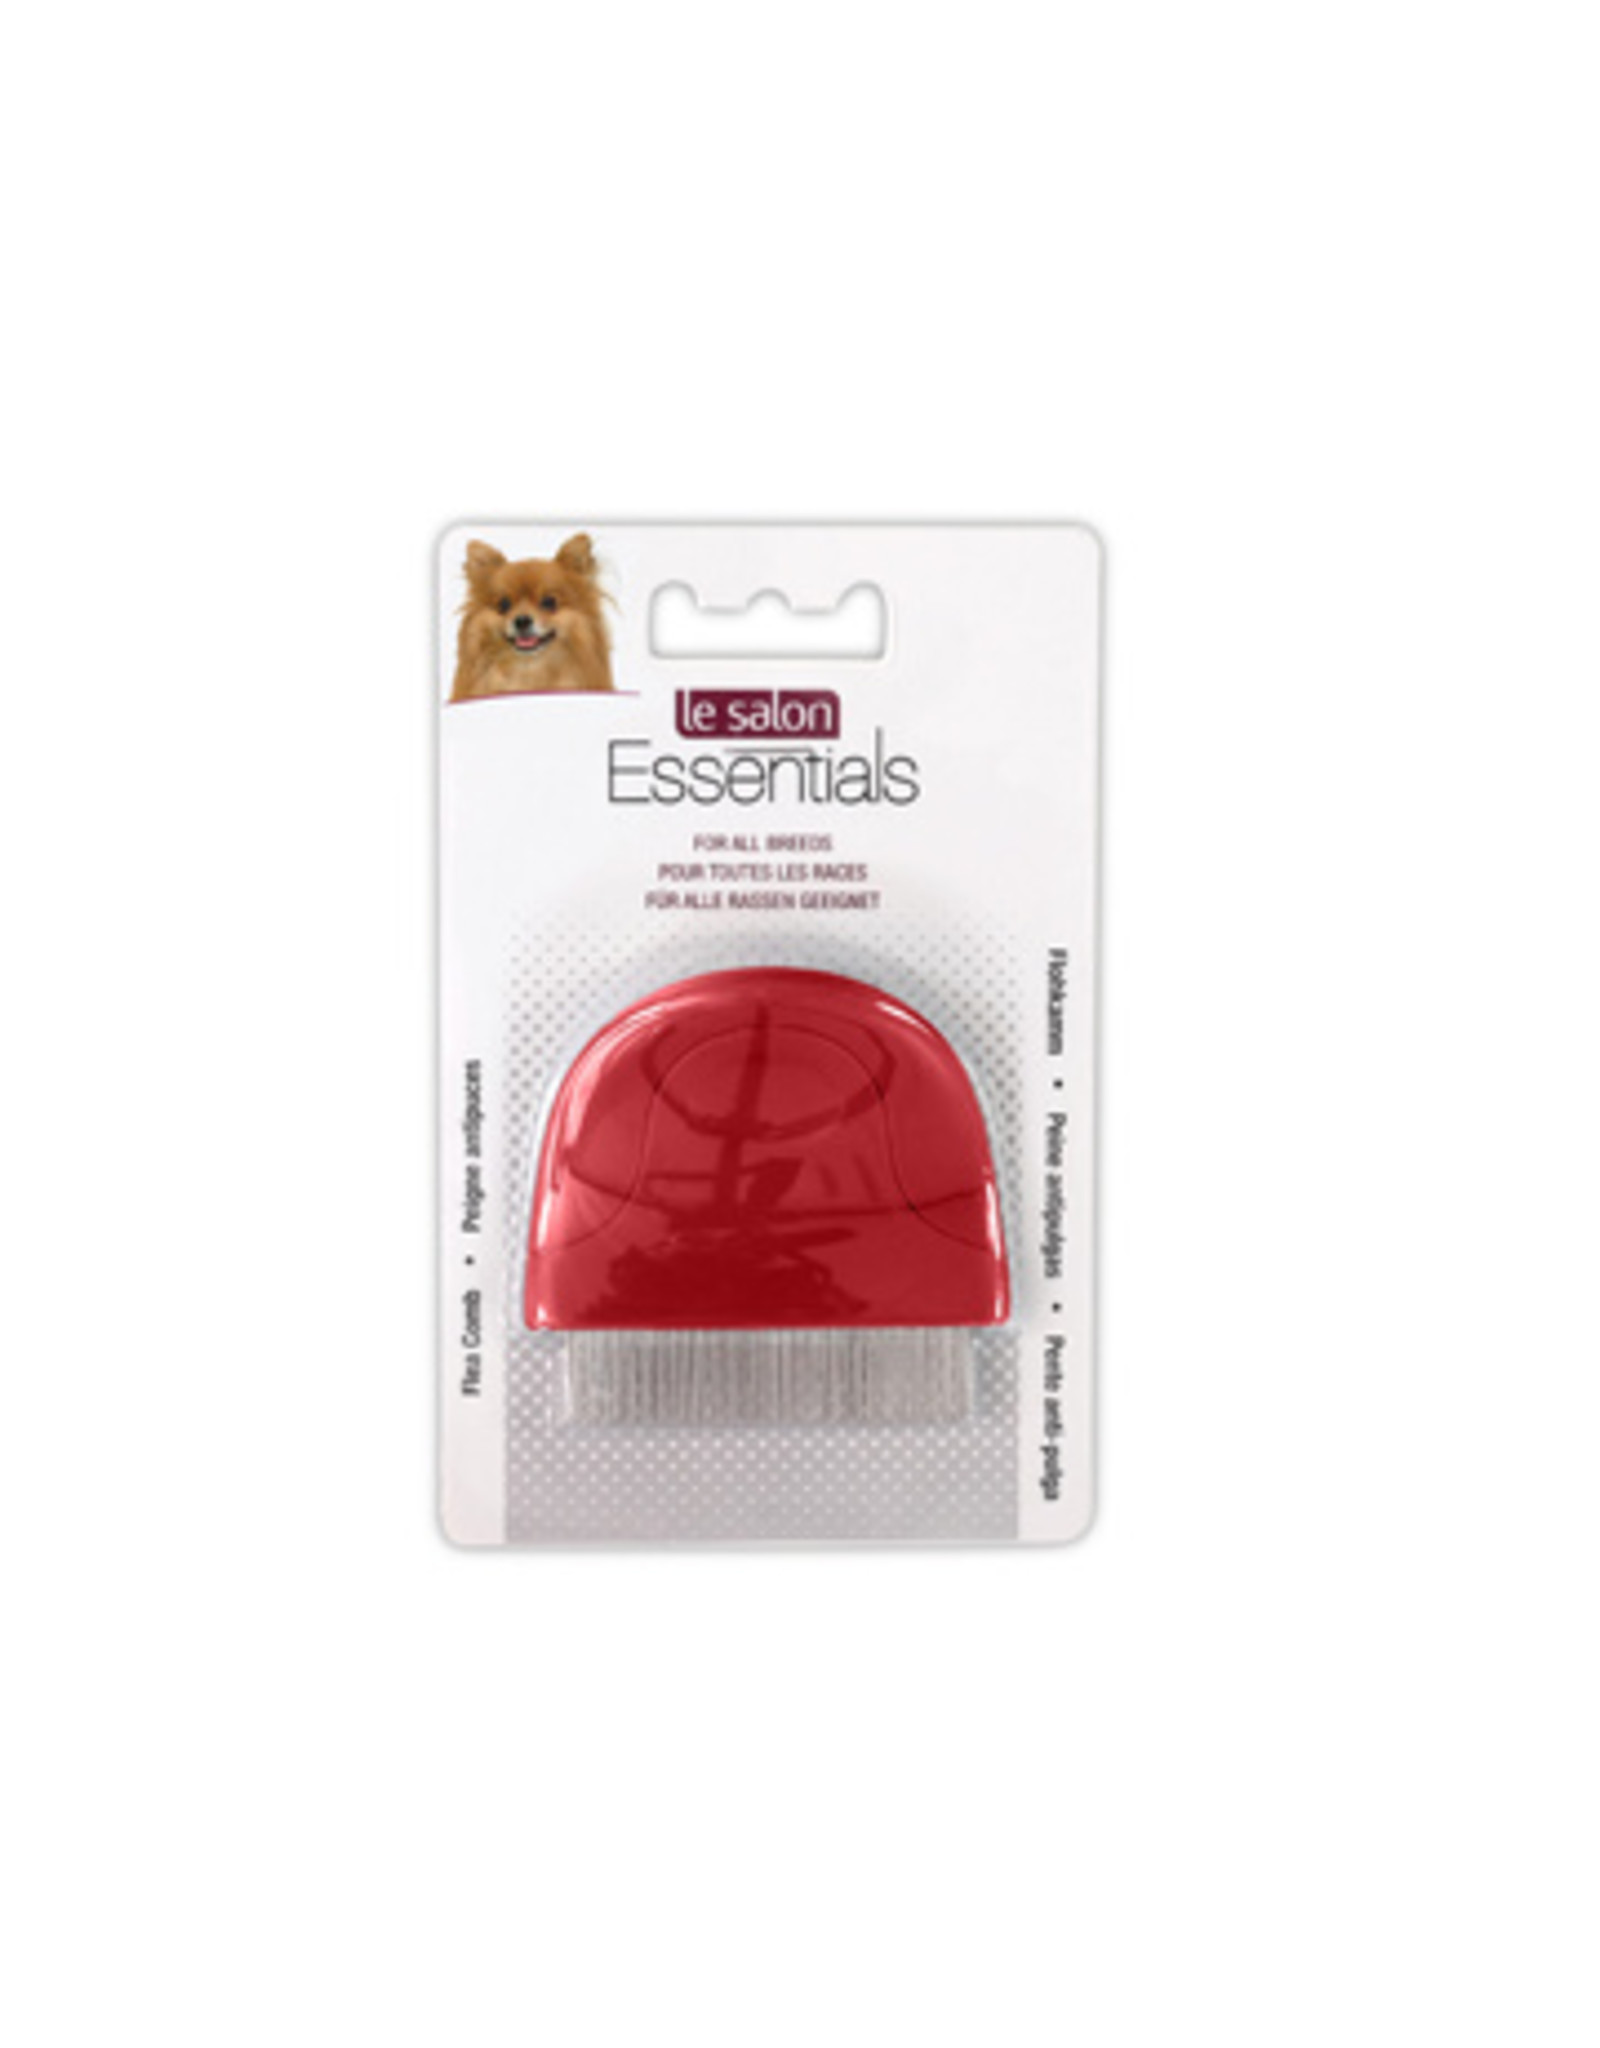 LS - Le Salon Le Salon Essentials Dog Flea Comb